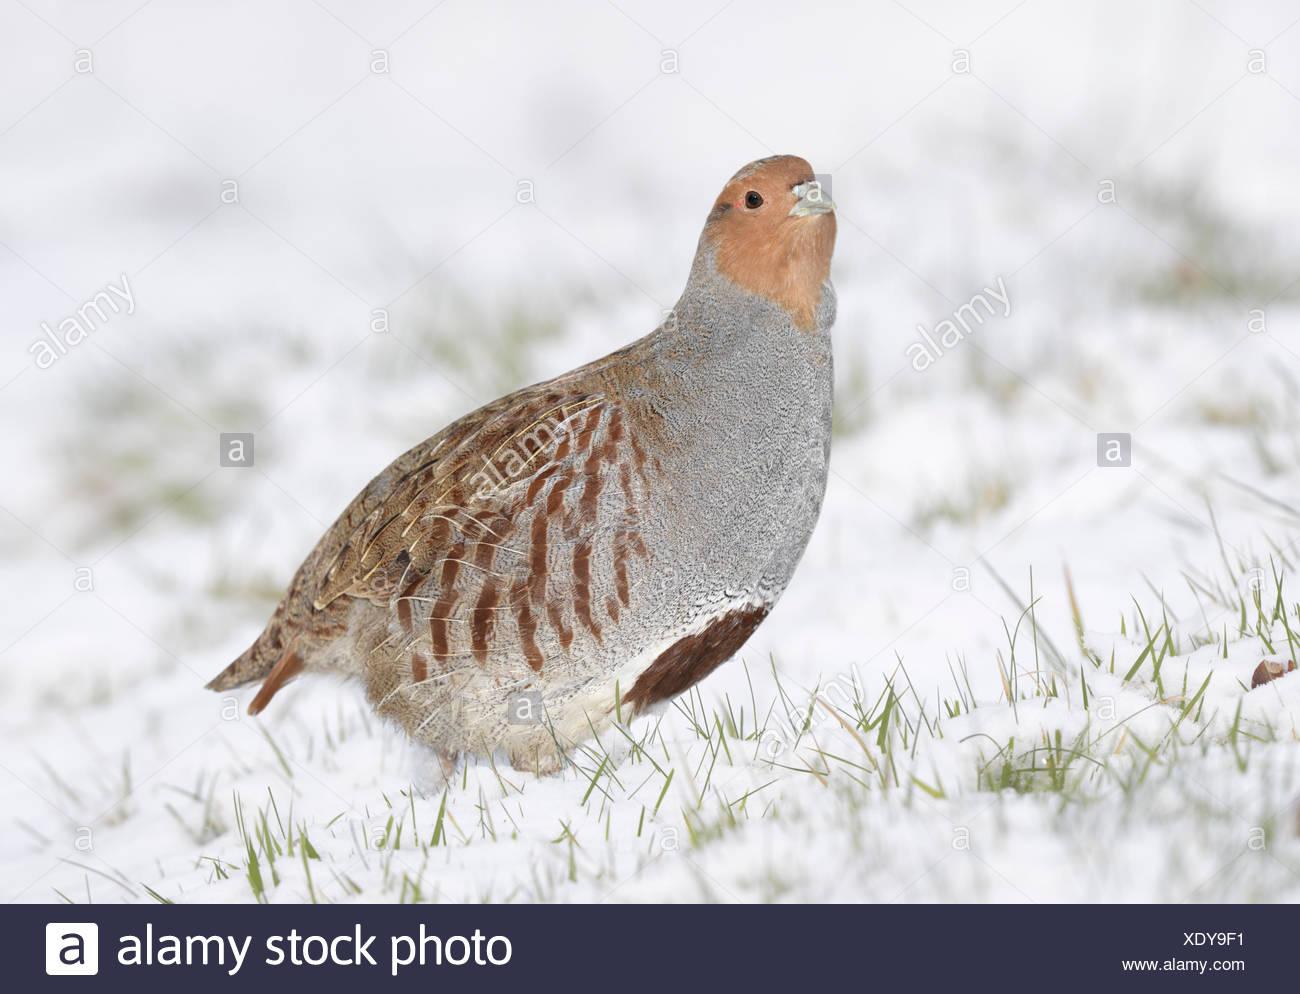 Grey Partridge Perdix perdix - Stock Image